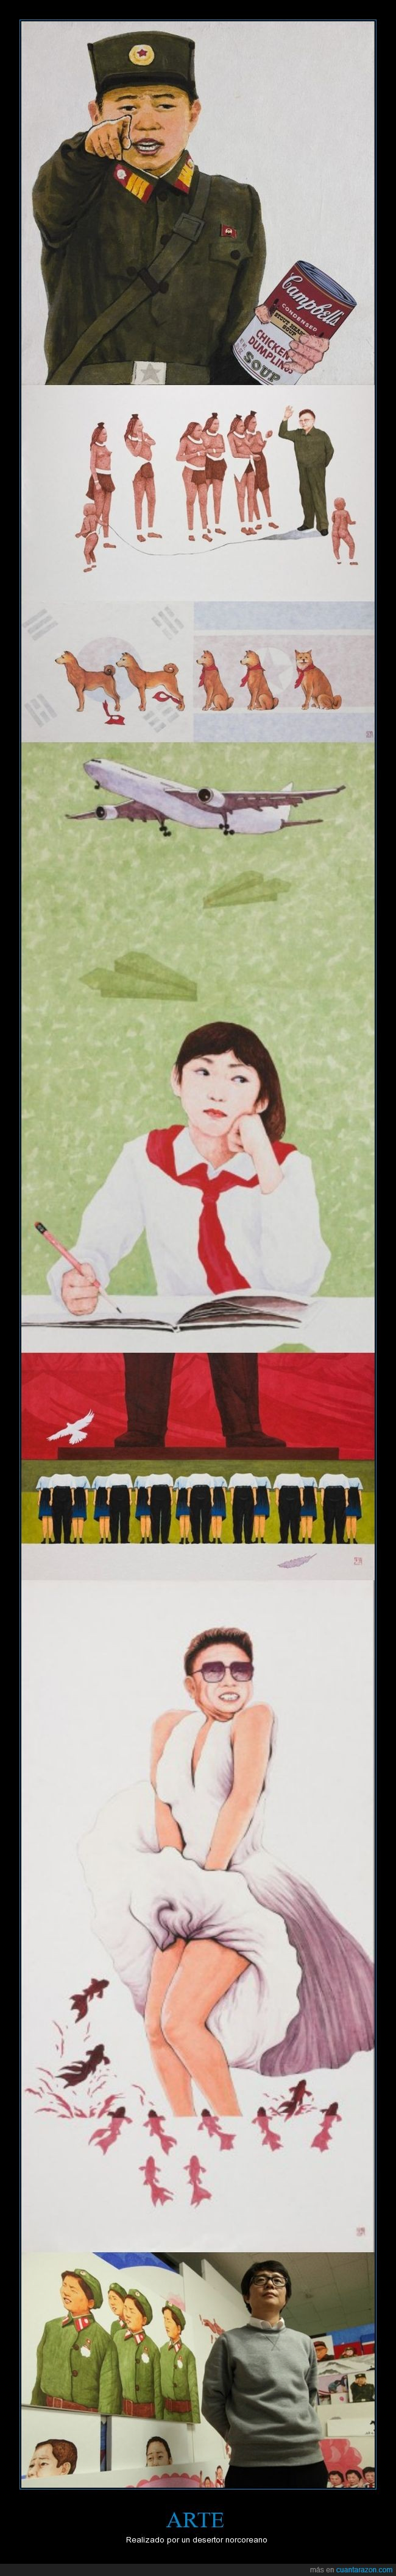 Arte,Corea,Cultura,Norte,Pintura,reivindicación,Stark